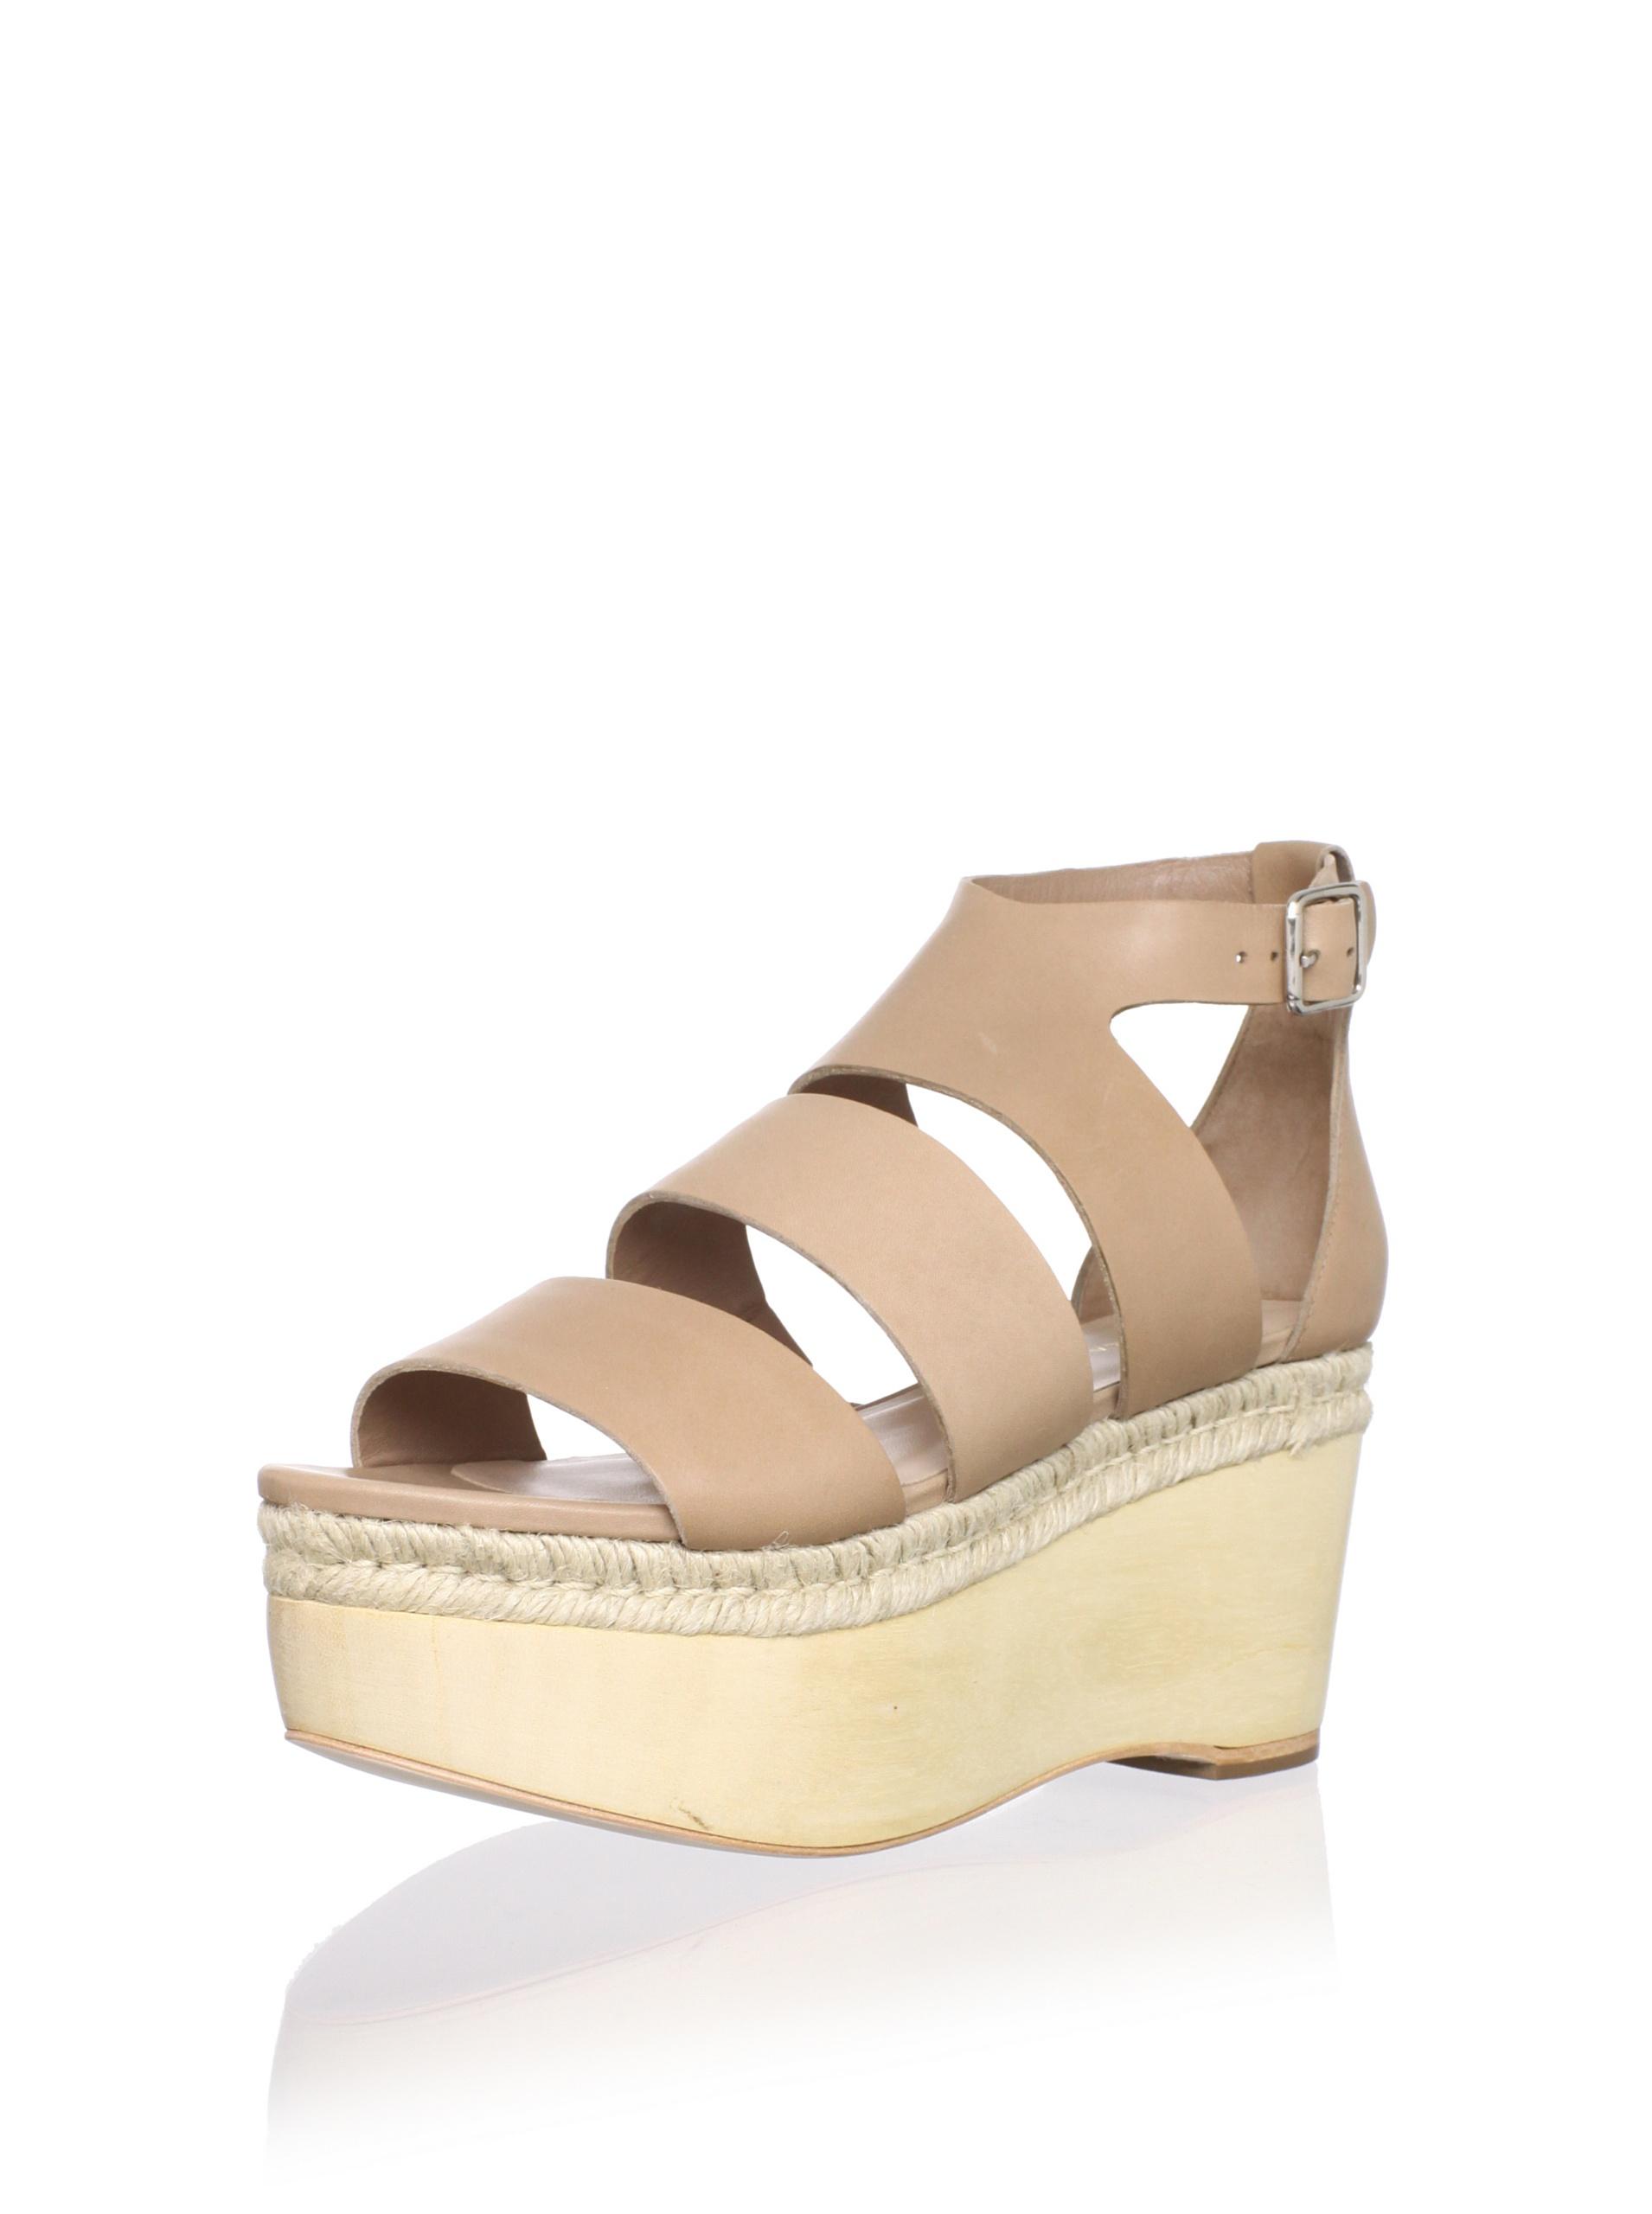 Loeffler Randall Women's Sasha Platform Sandal (Tortora)